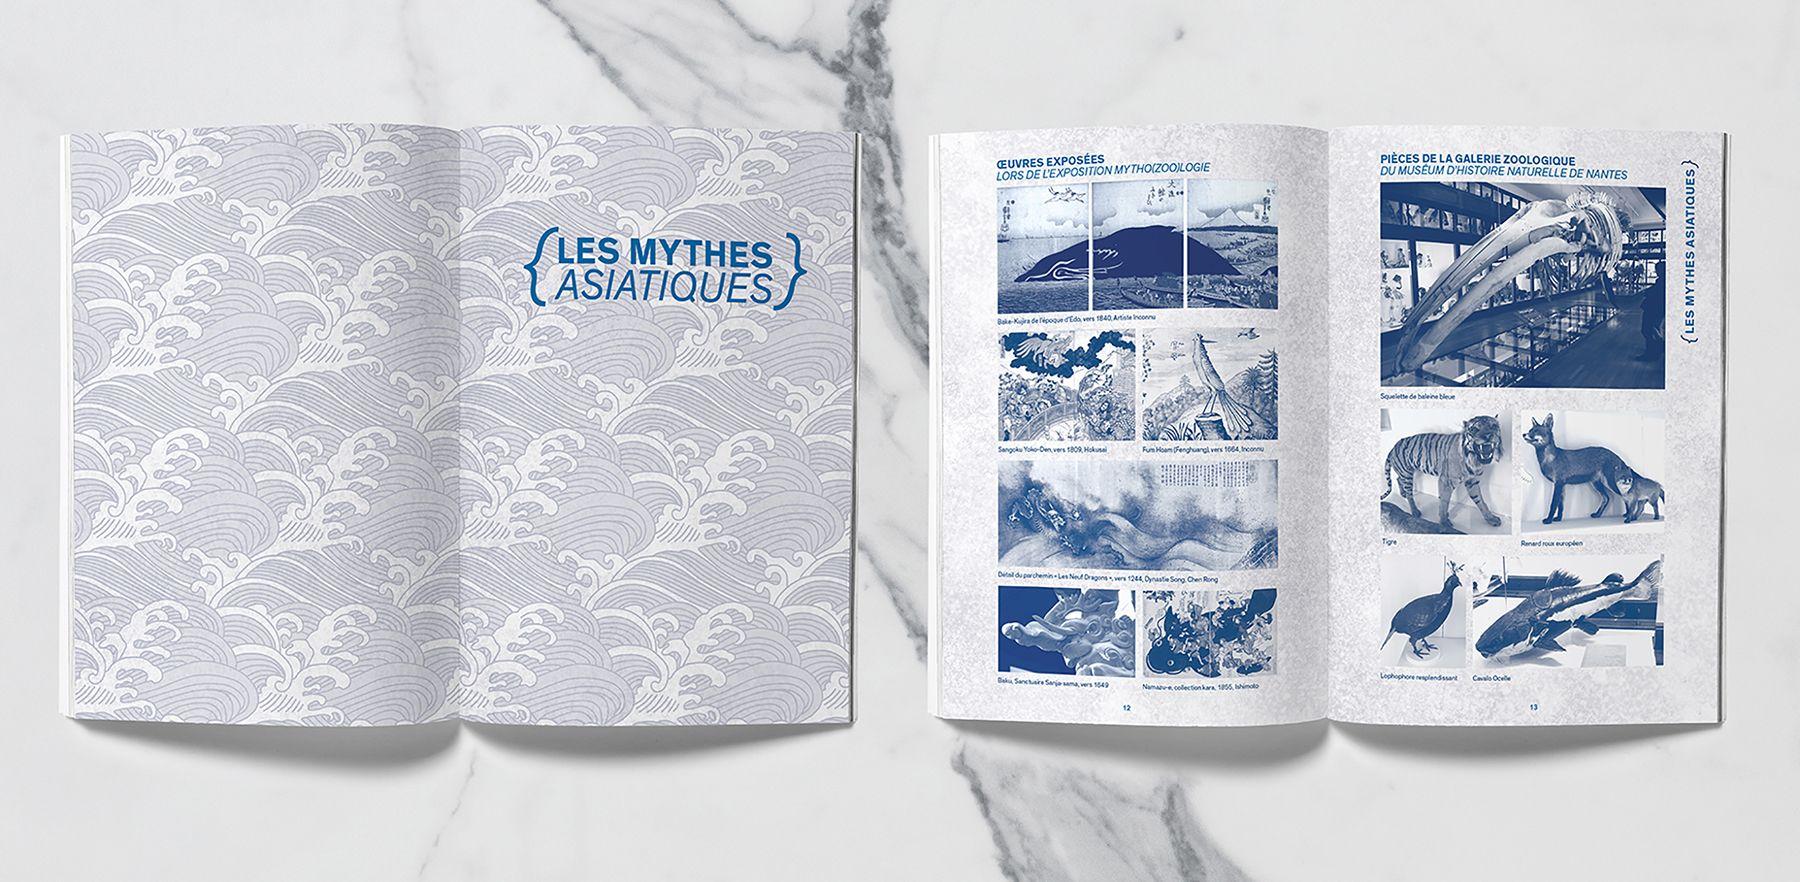 Catégorie & oeuvres du recueil Mytho(zoo)logie